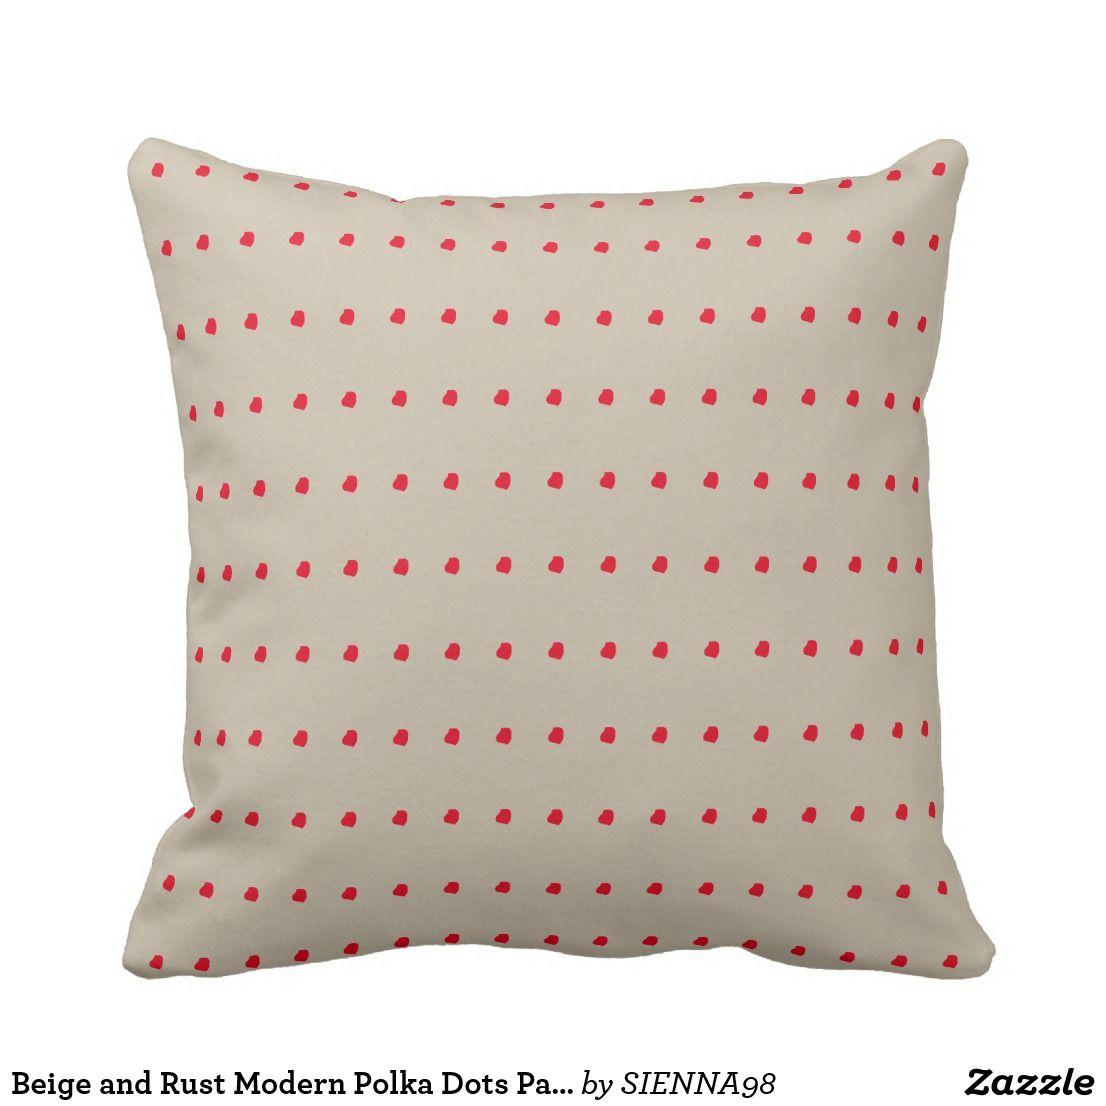 Beige and Rust Modern Polka Dots Pattern